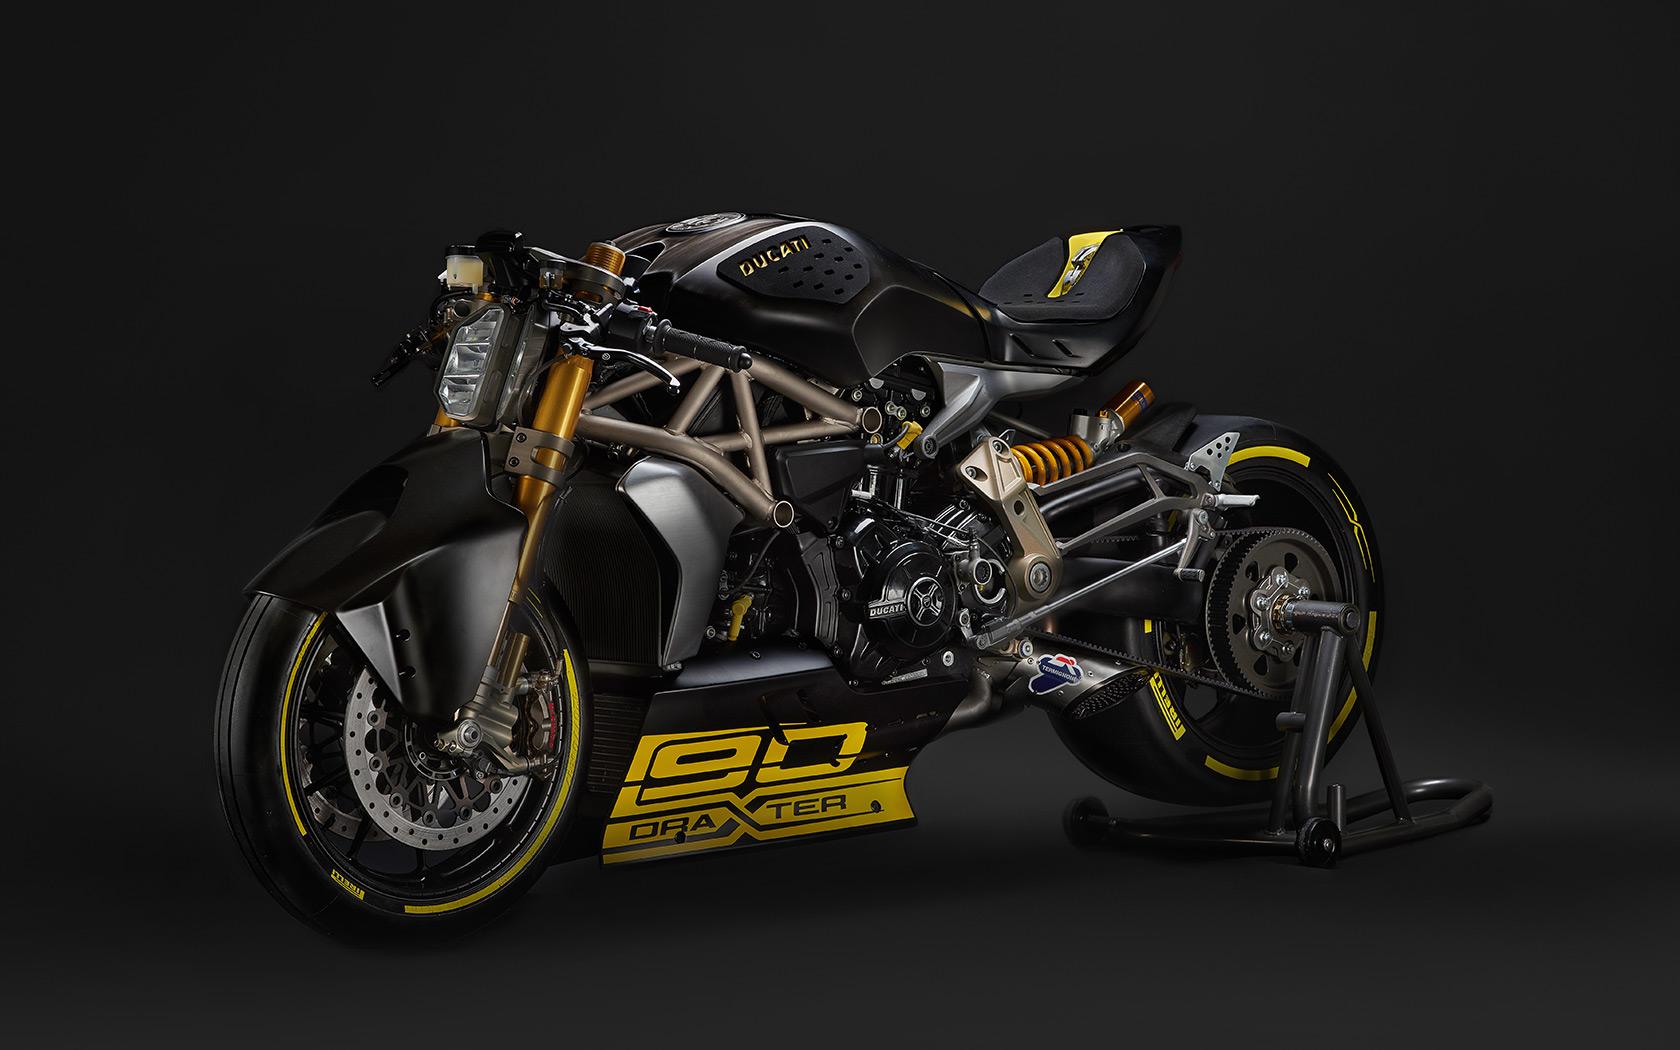 Ducati DraXter - 2016 - avant / front